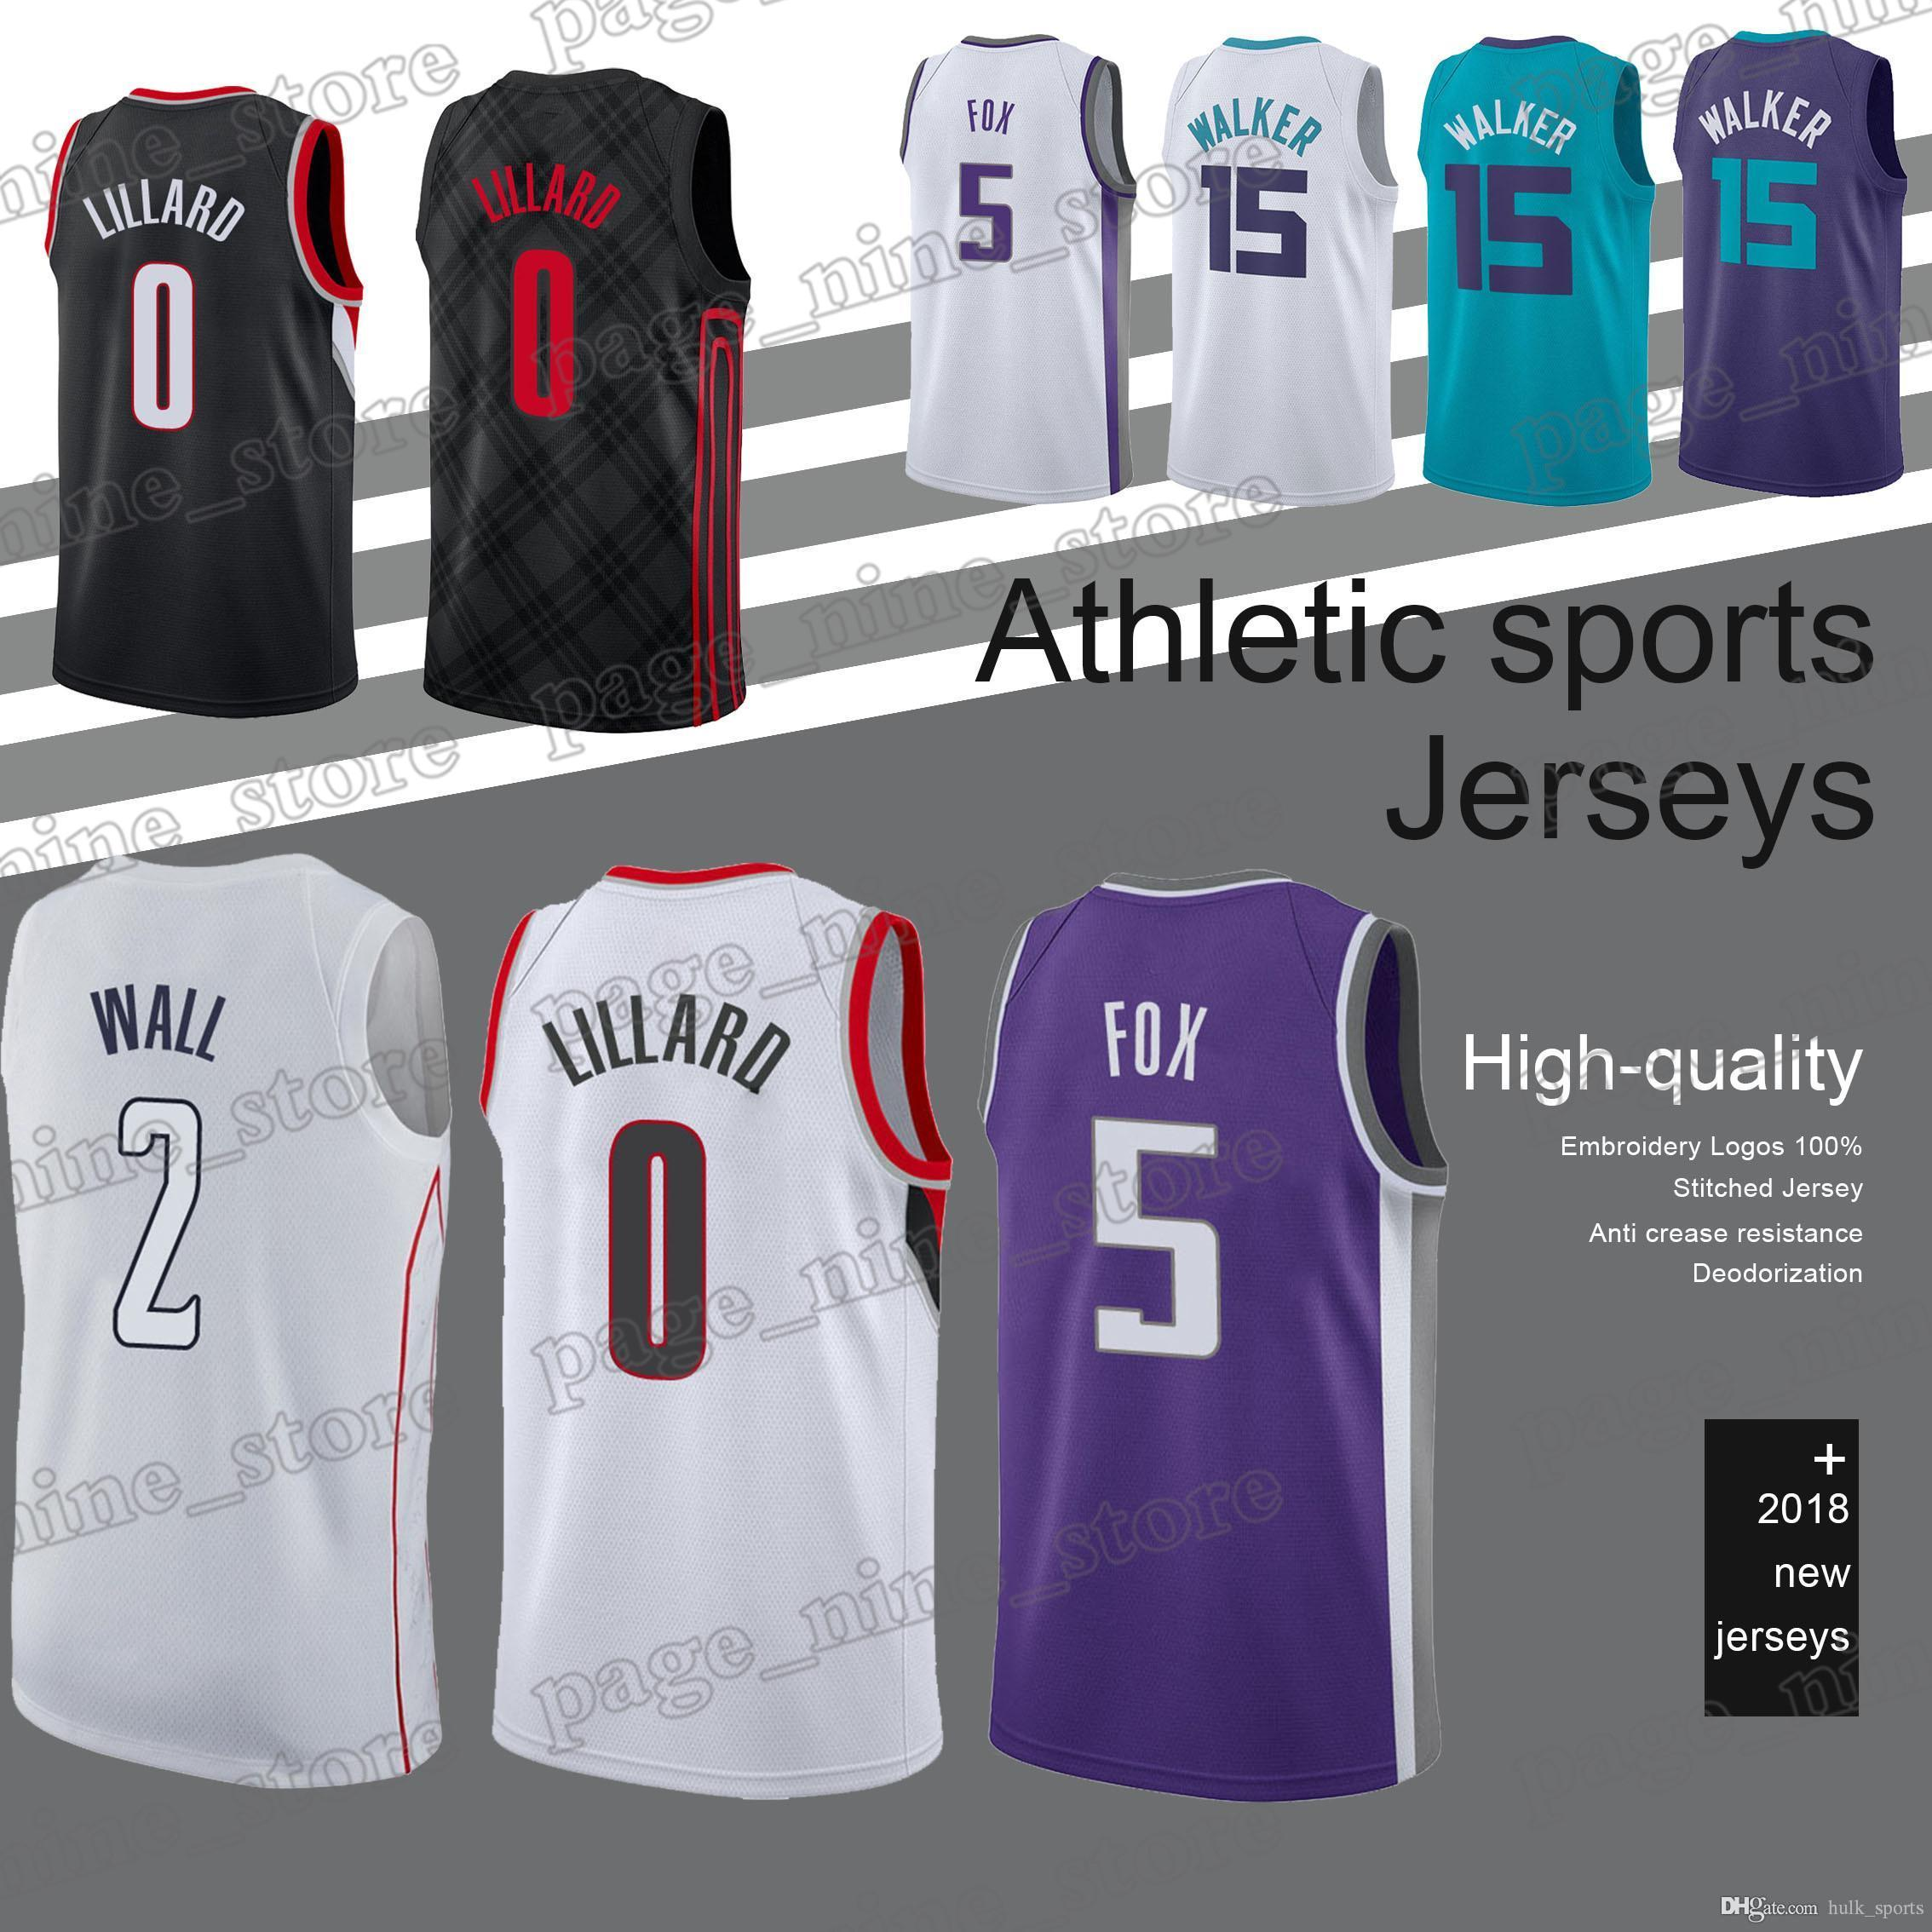 finest selection 12f3f 34439 Charlotte jerseys Hornets 35 Bagley III 5 Fox 15 Walker jersey 2 Wall 0  Lillard Hot sale basketball jerseys